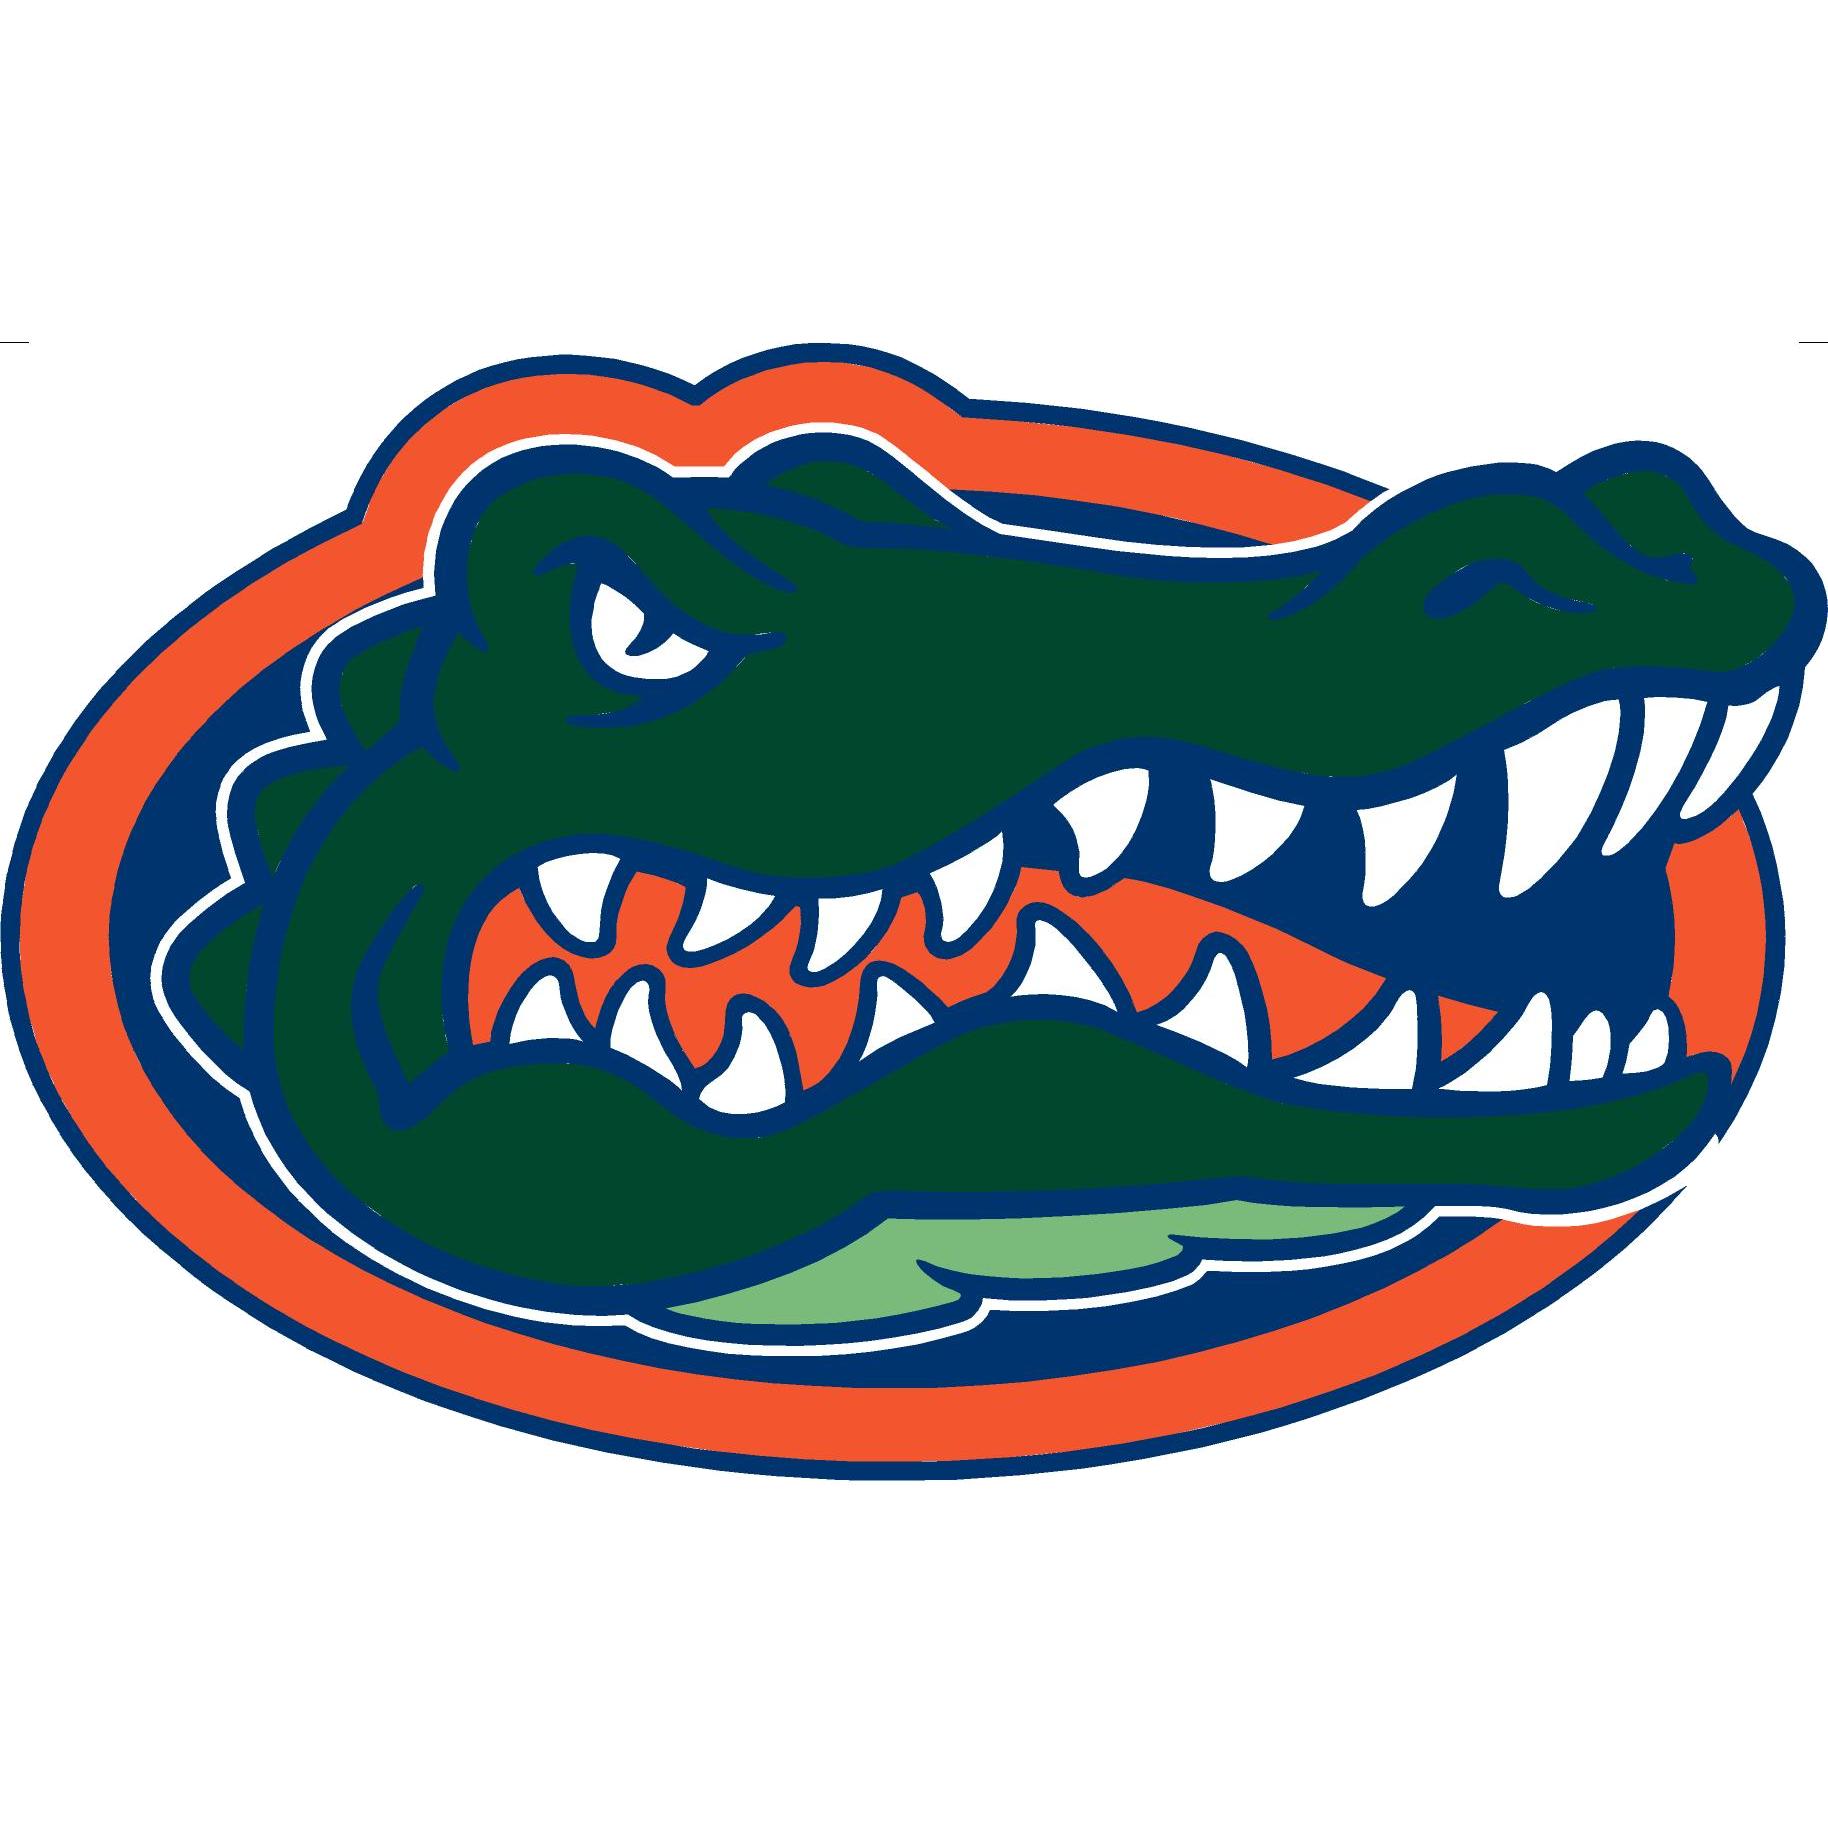 Florida gator eating group. Lacrosse clipart women's lacrosse